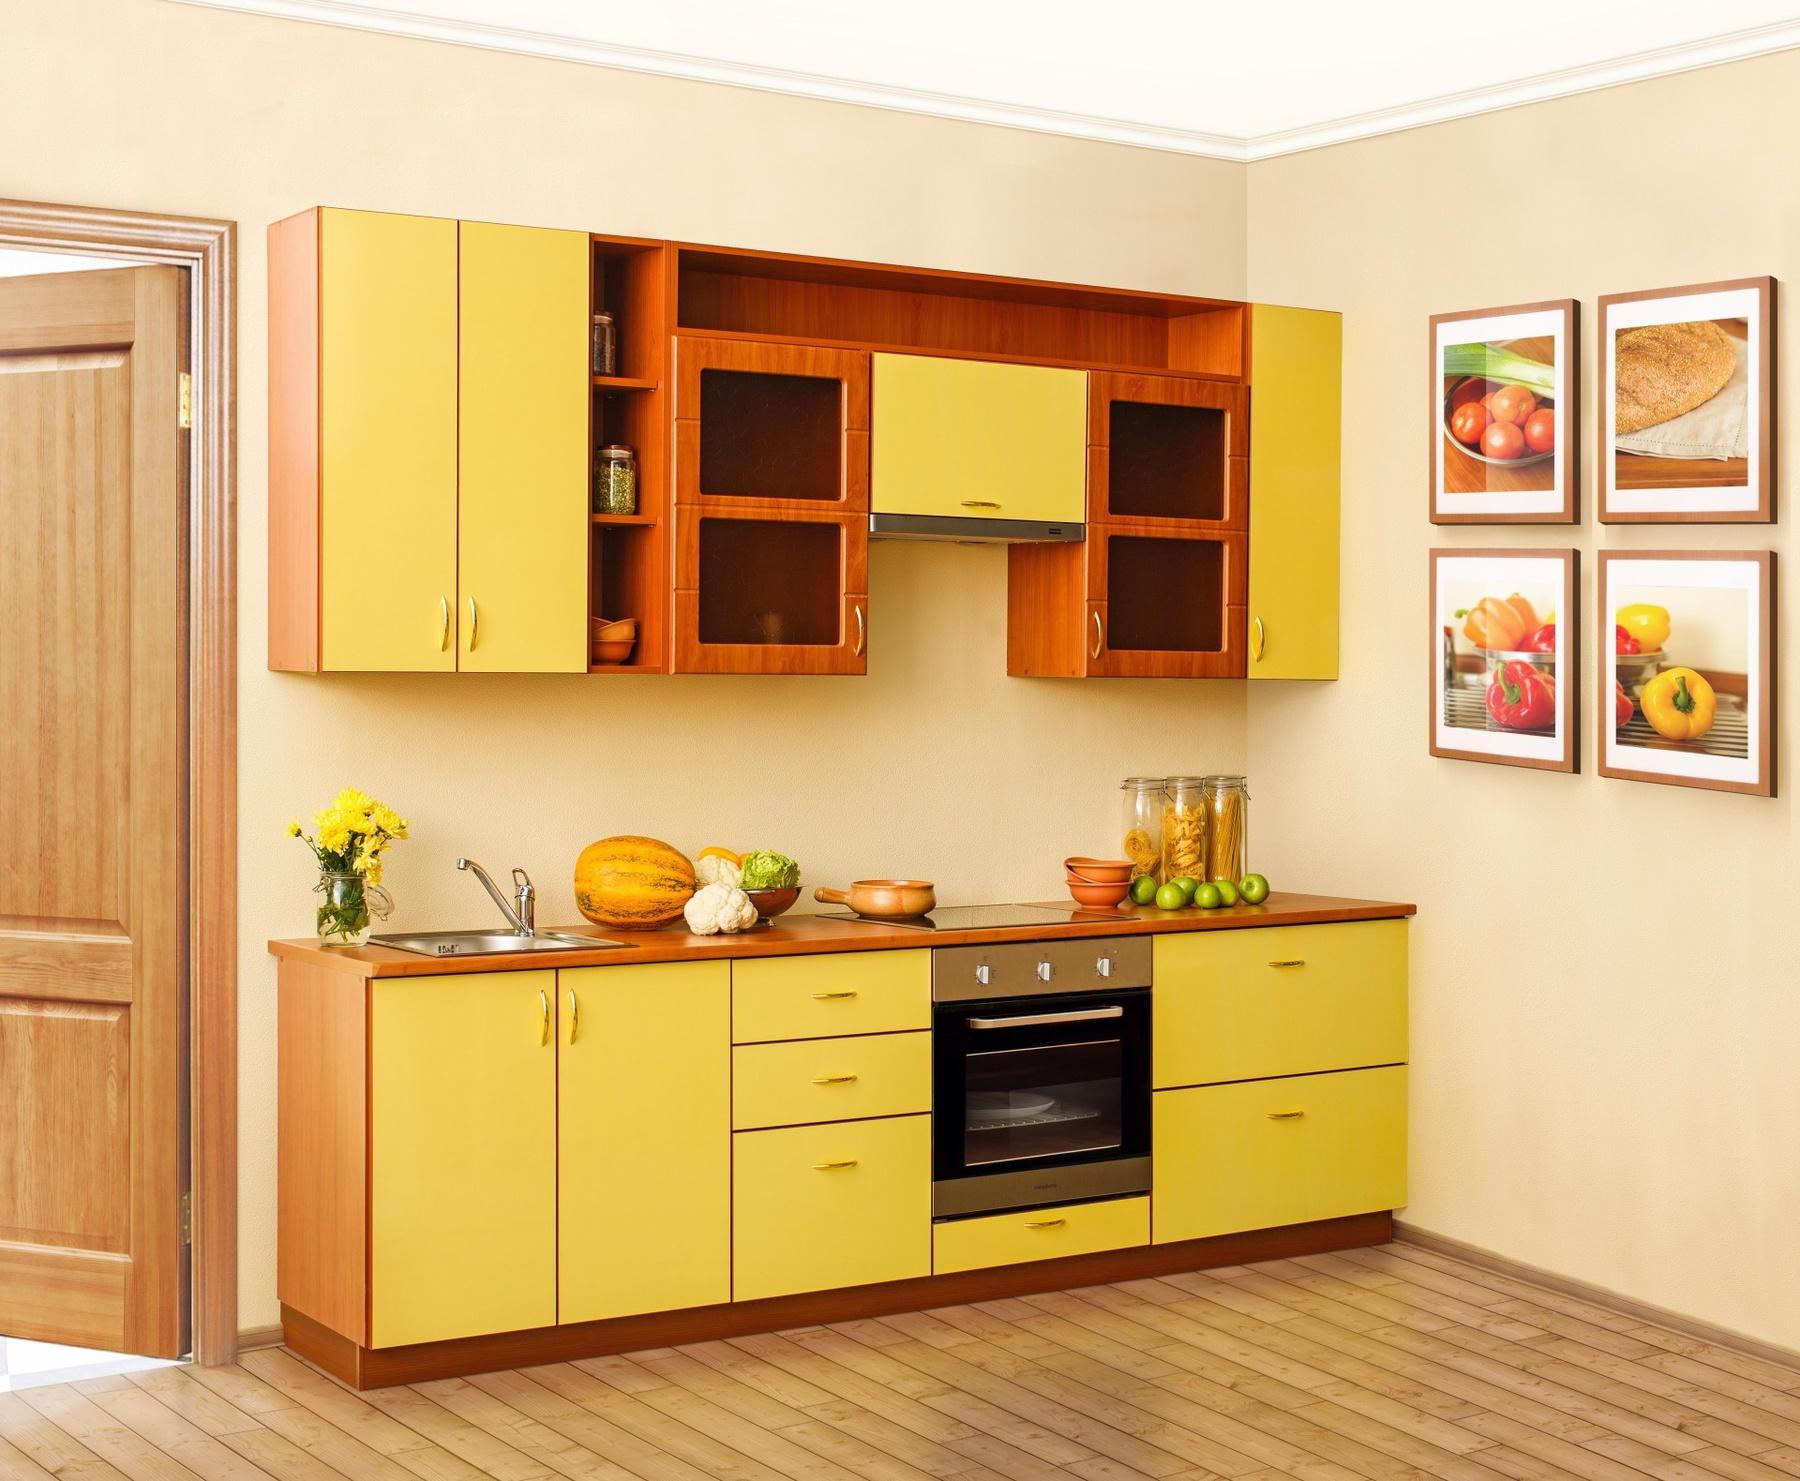 Желто-коричневый кухонный гарнитур